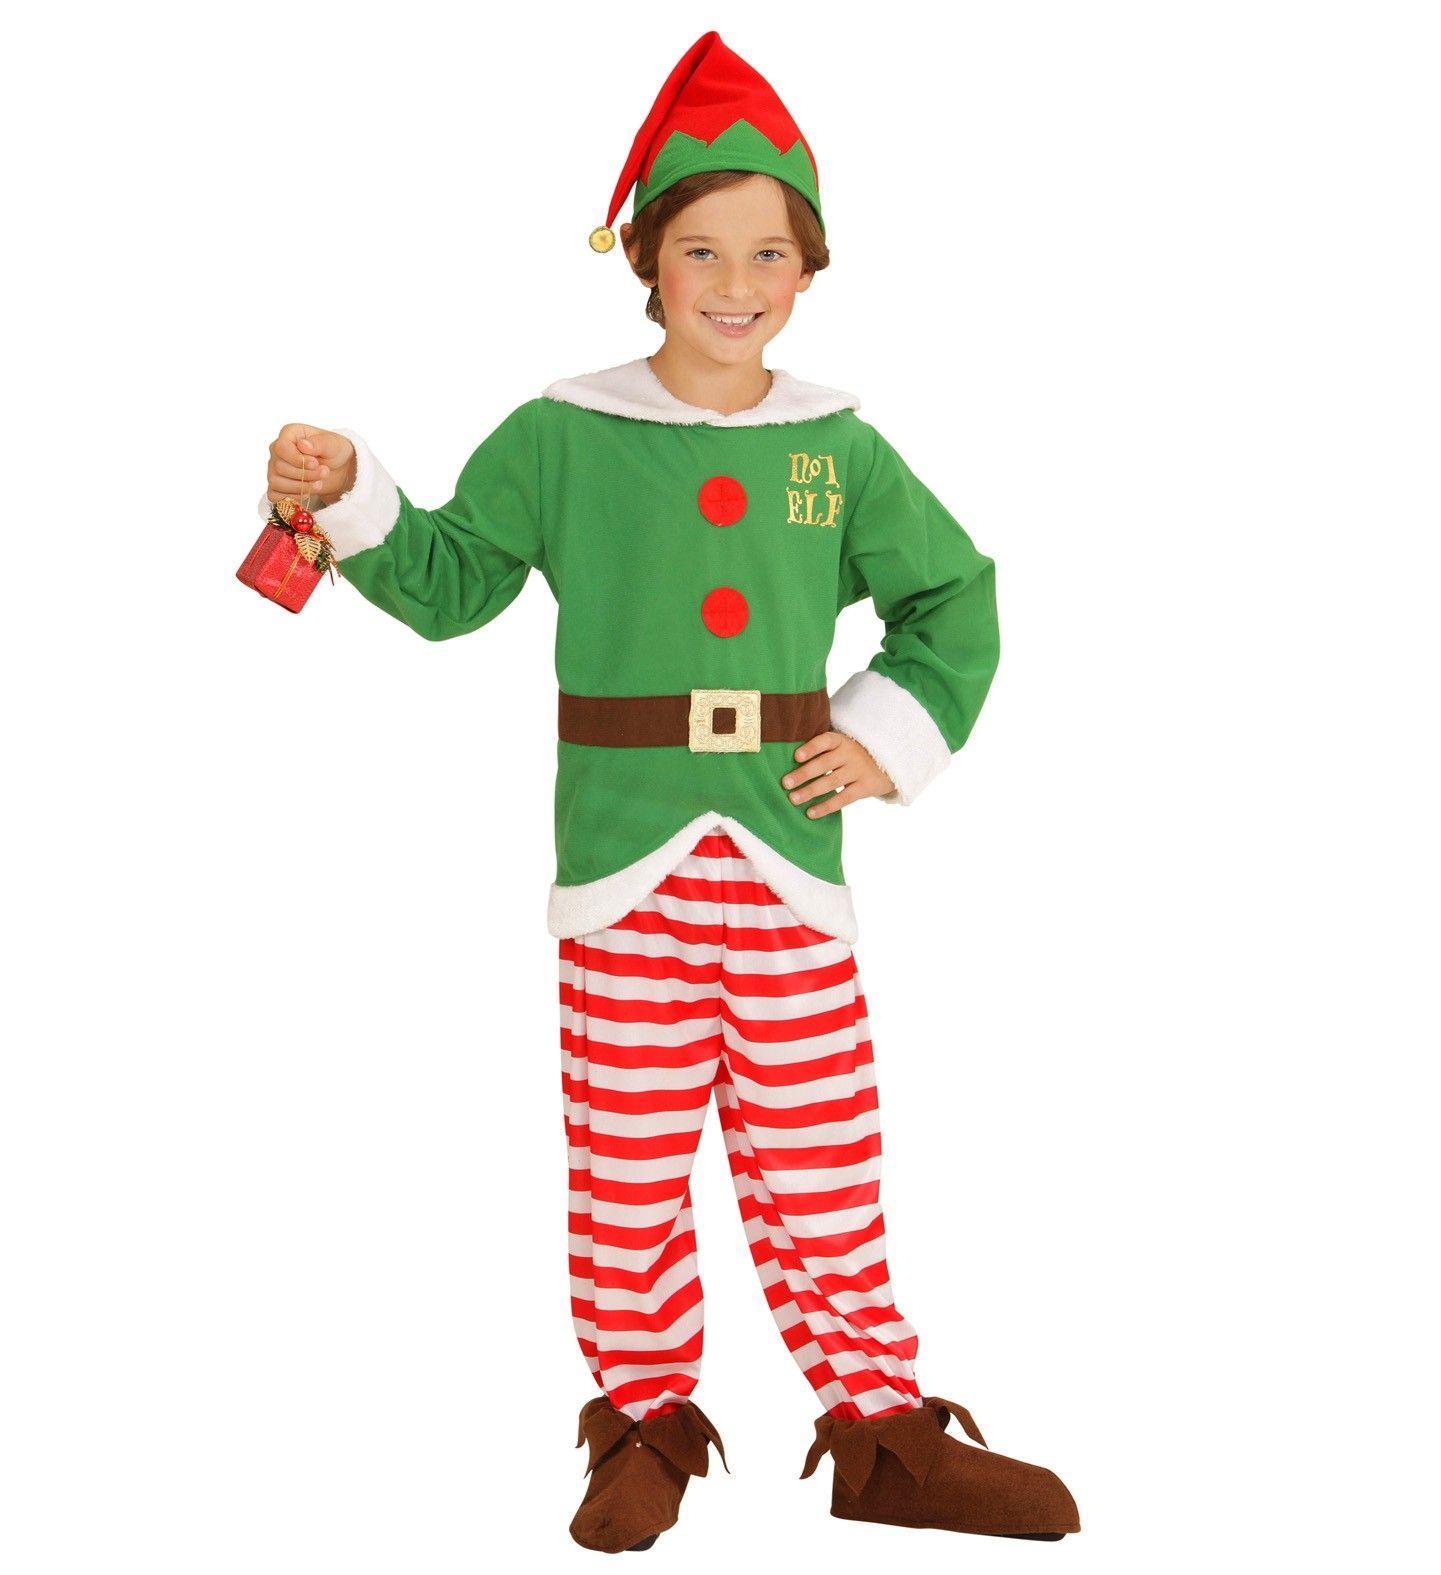 disfraz de elfo - Disfraz De Elfa